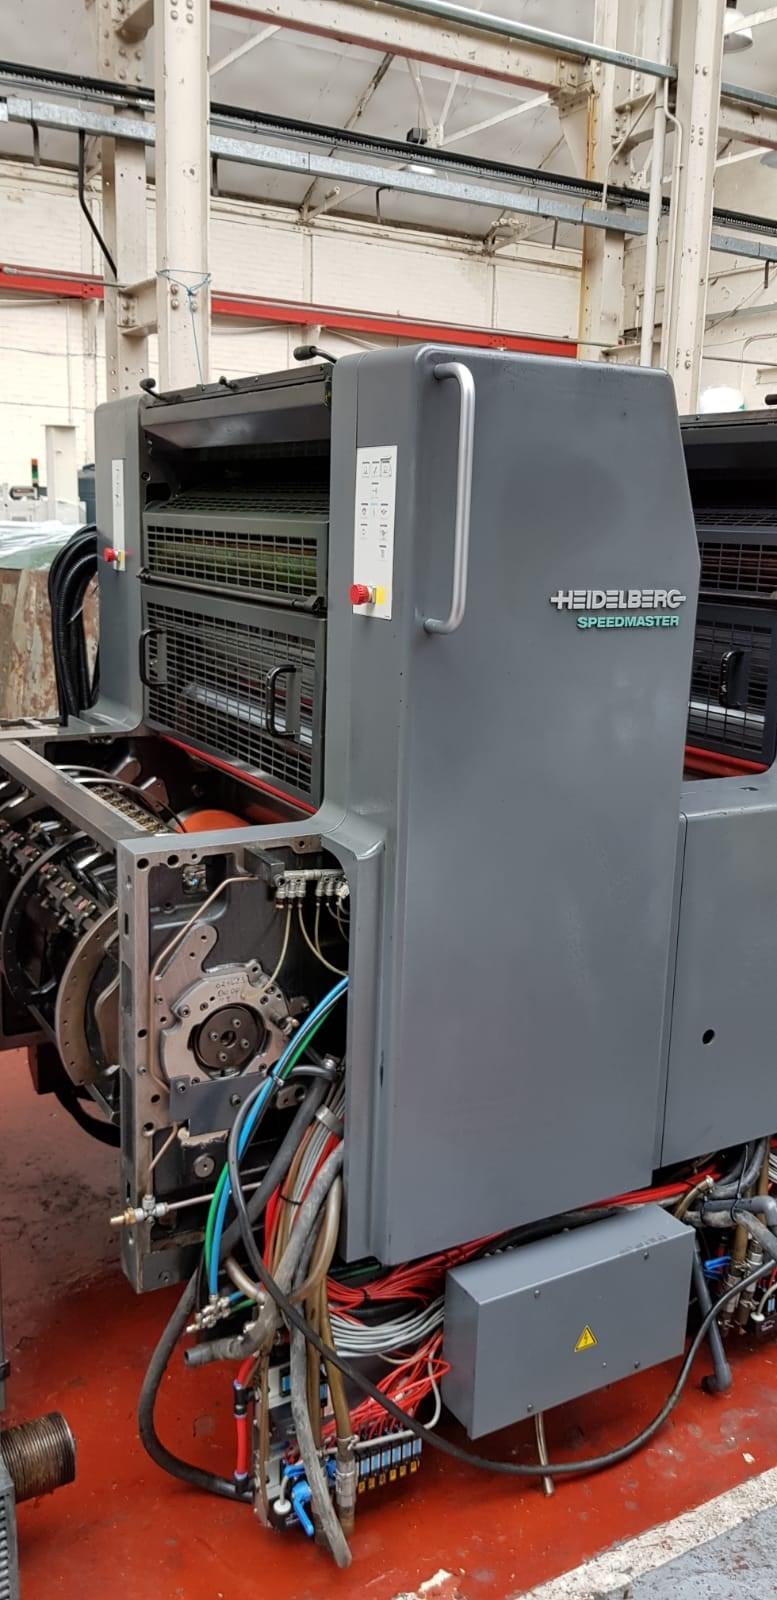 Heidelberg SM74 5 P 3 L